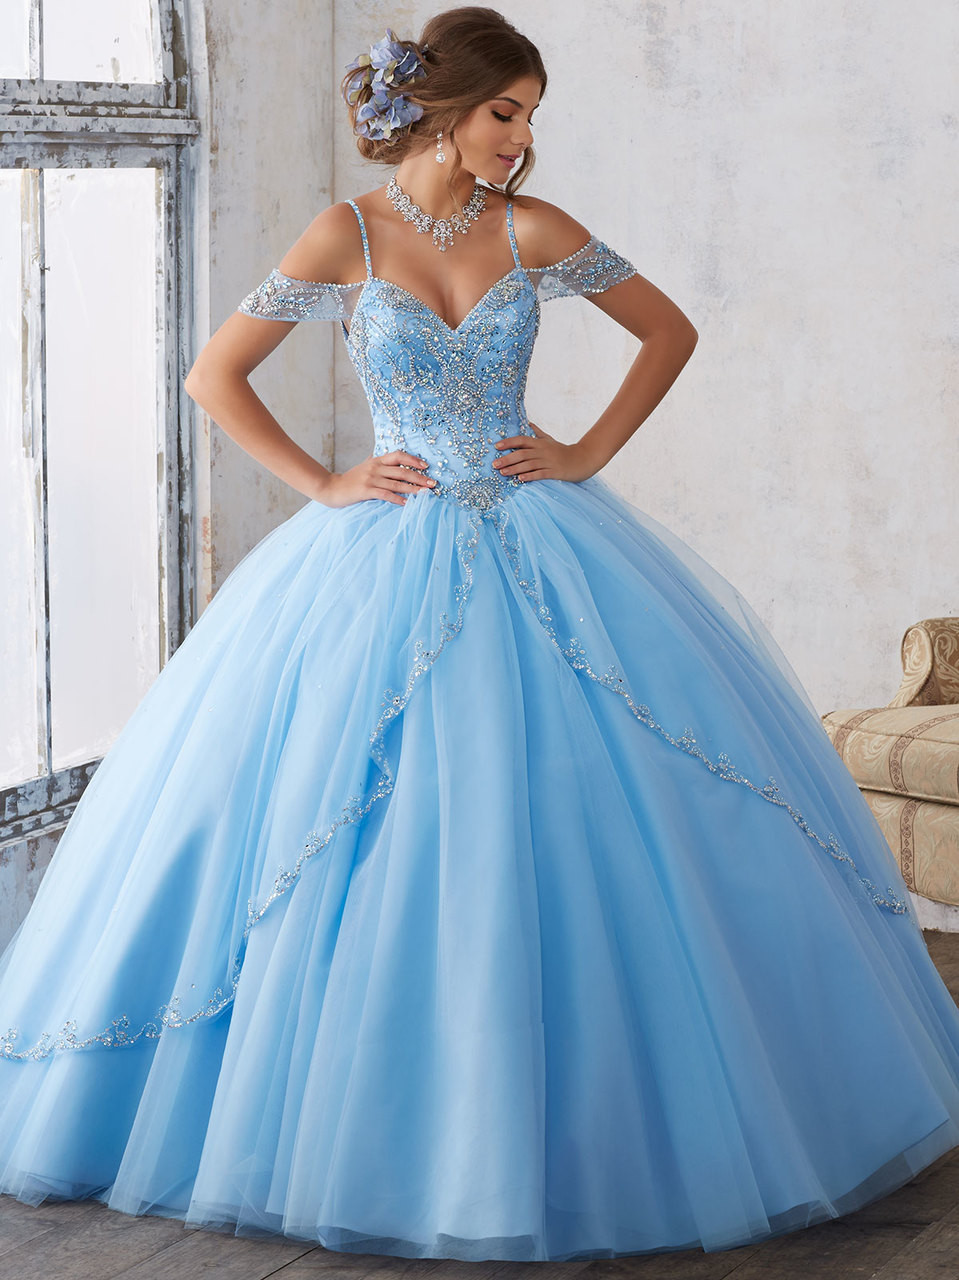 417670f23e1 agua teal viscaya quinceanera dresses – Fashion dresses